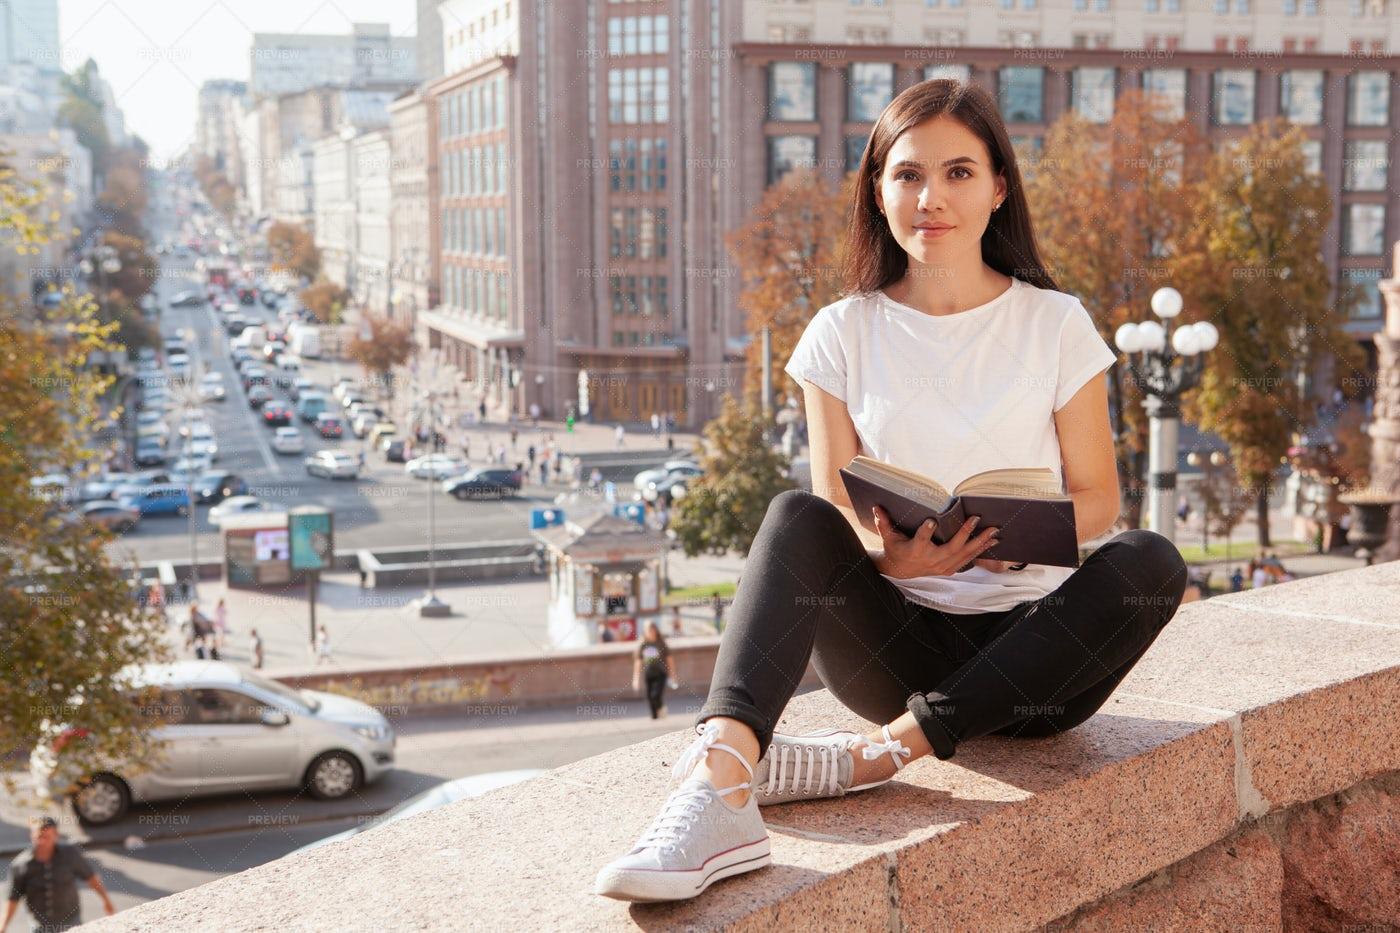 Woman Reading Book At Urban Center: Stock Photos